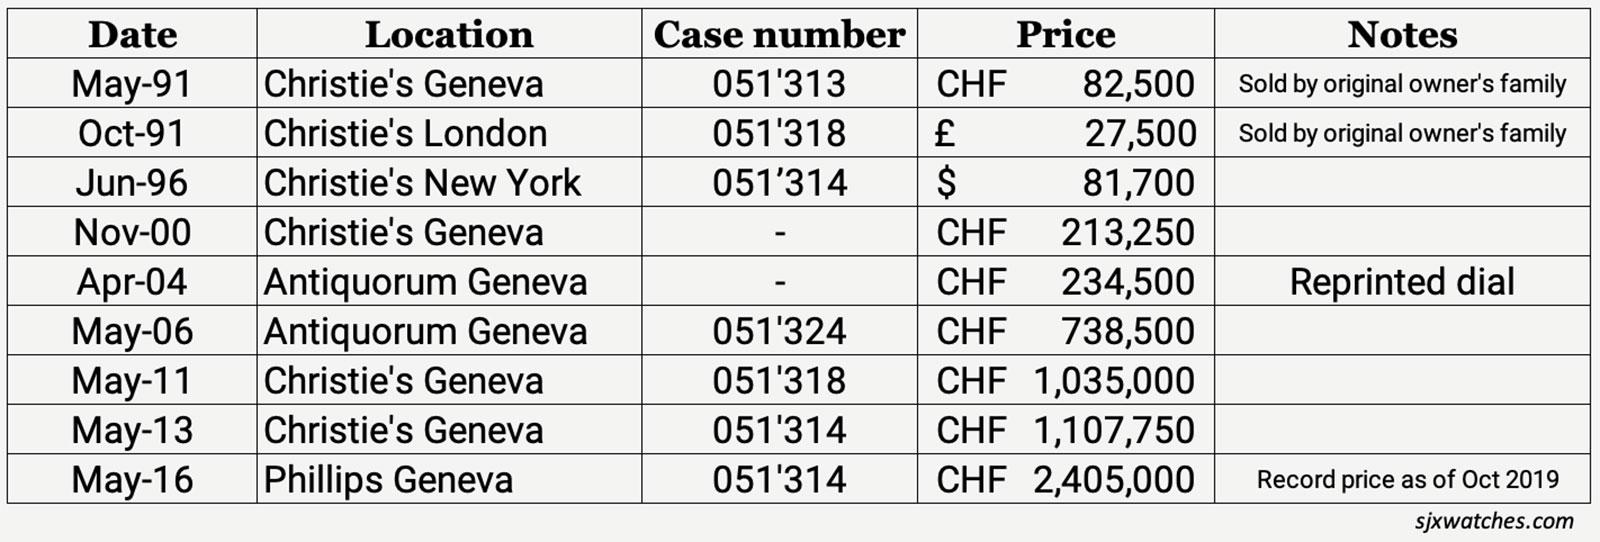 rolex 4113 split second price history